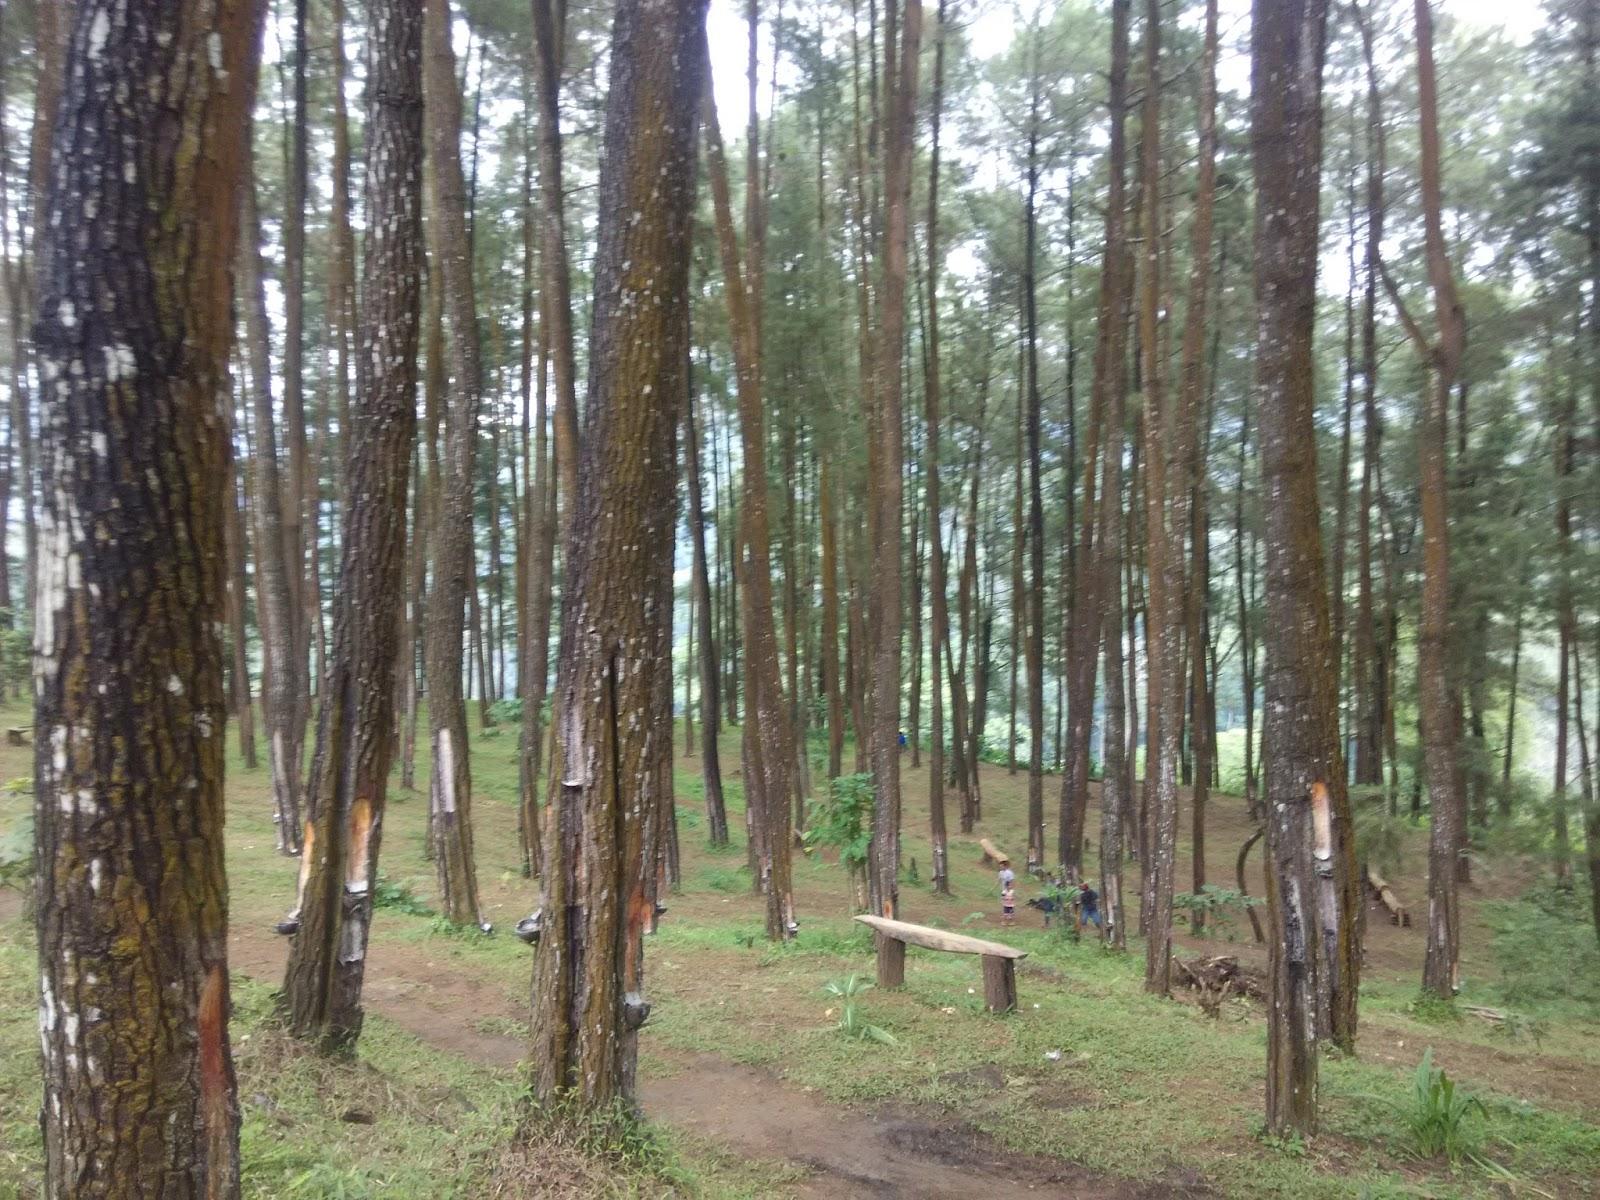 Hutan Pinus Nongko Ijo Suasana Objek Wisata Kare Kab Madiun